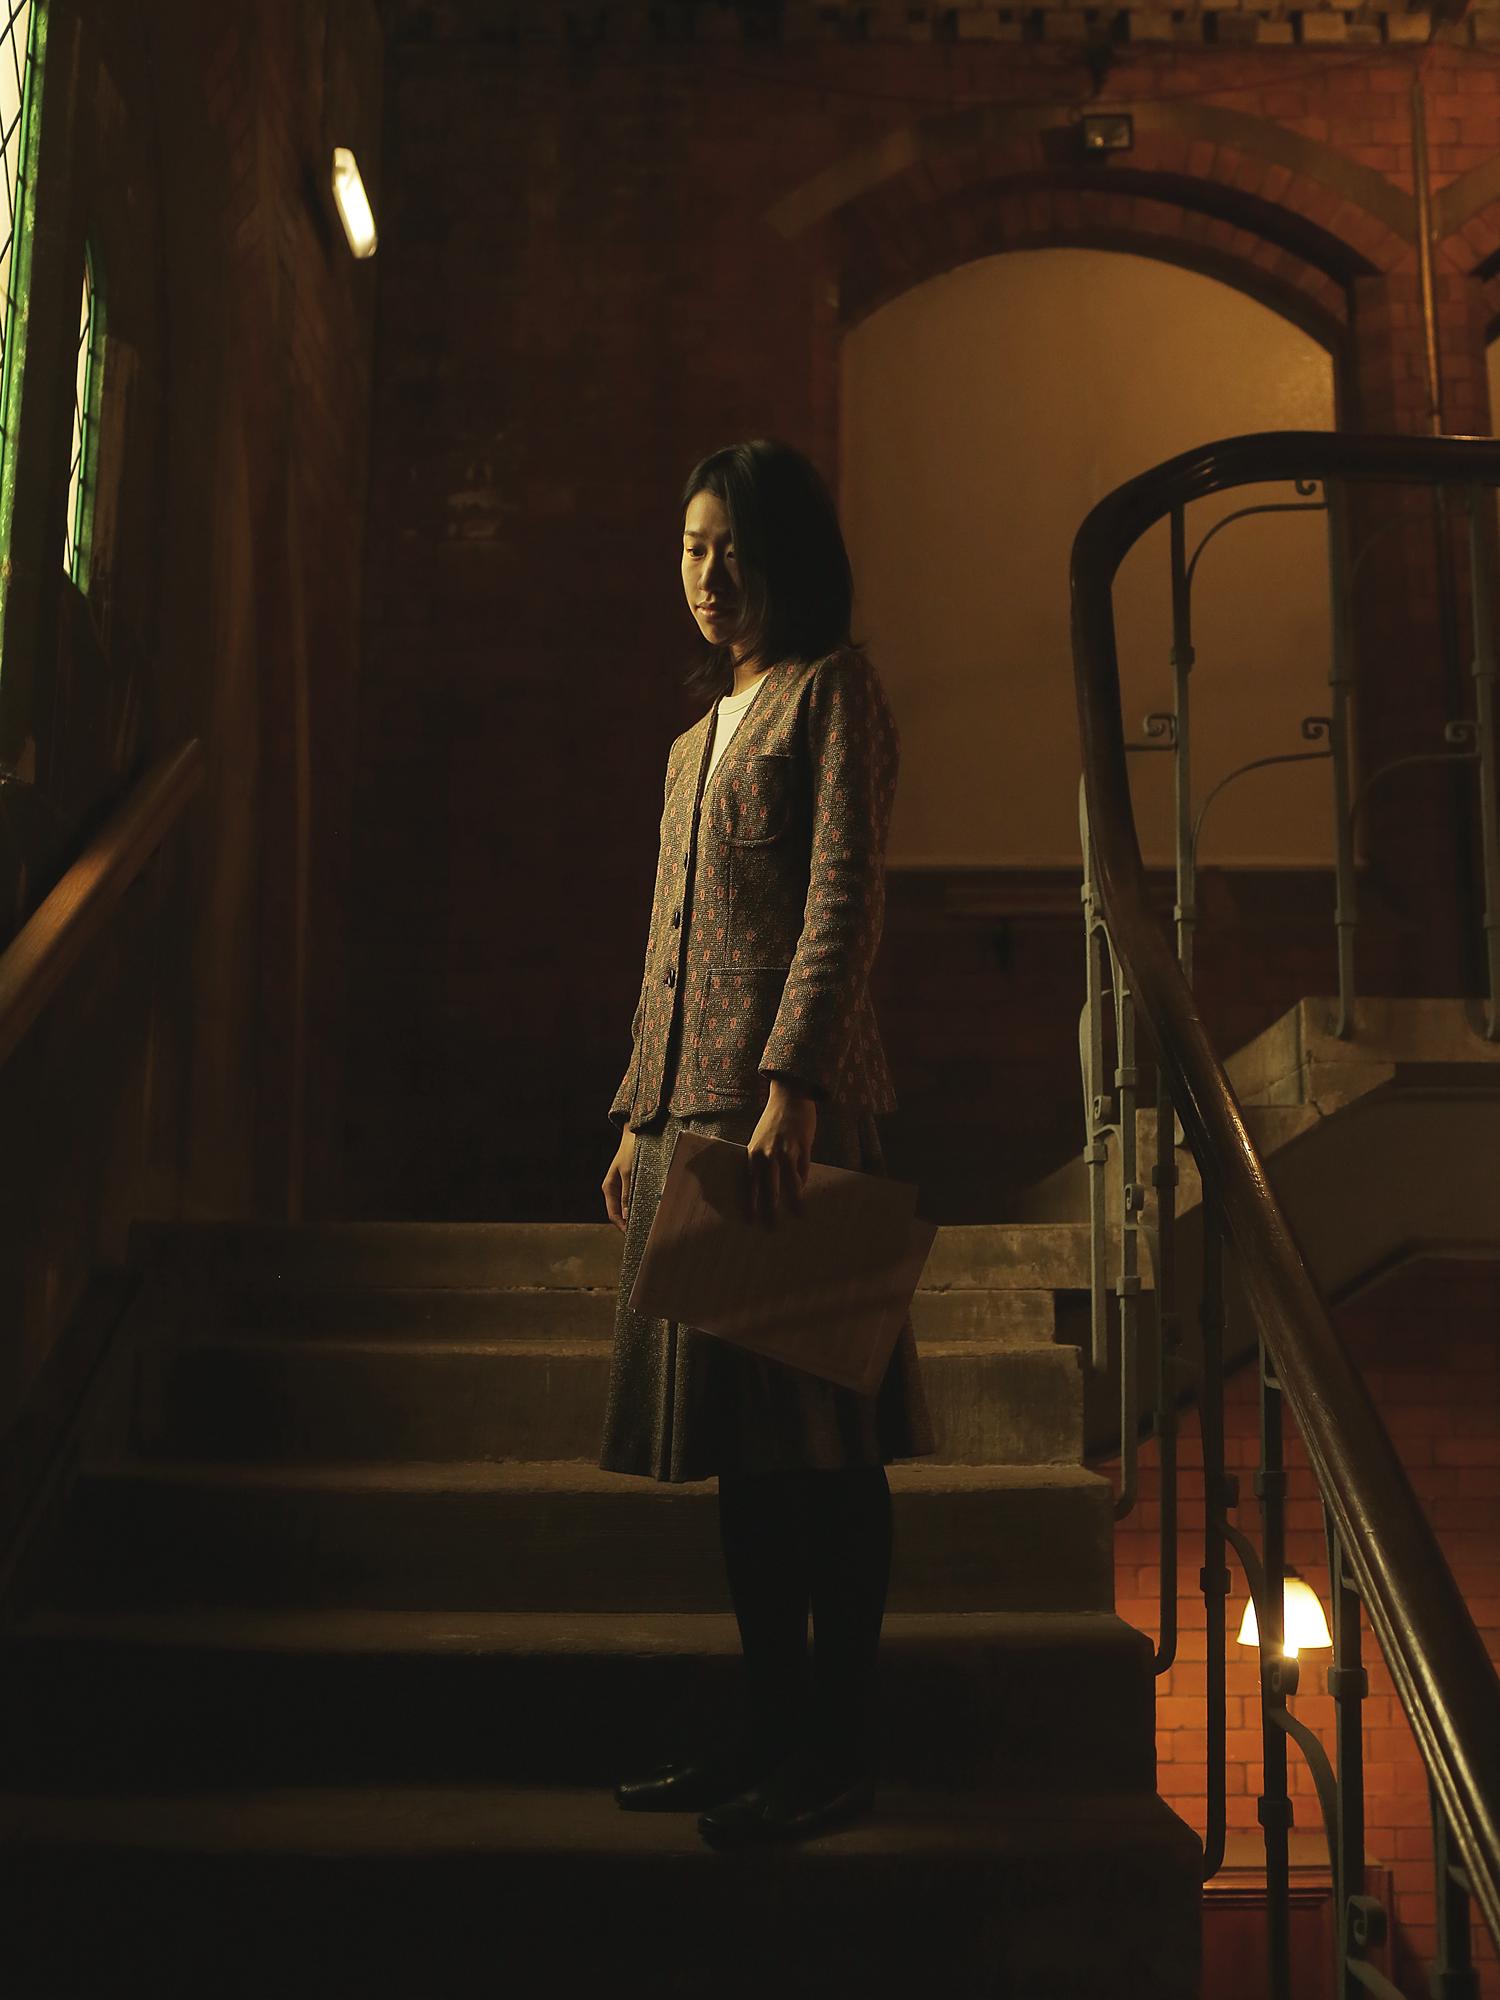 Hojo Tomoko, Sound Artist